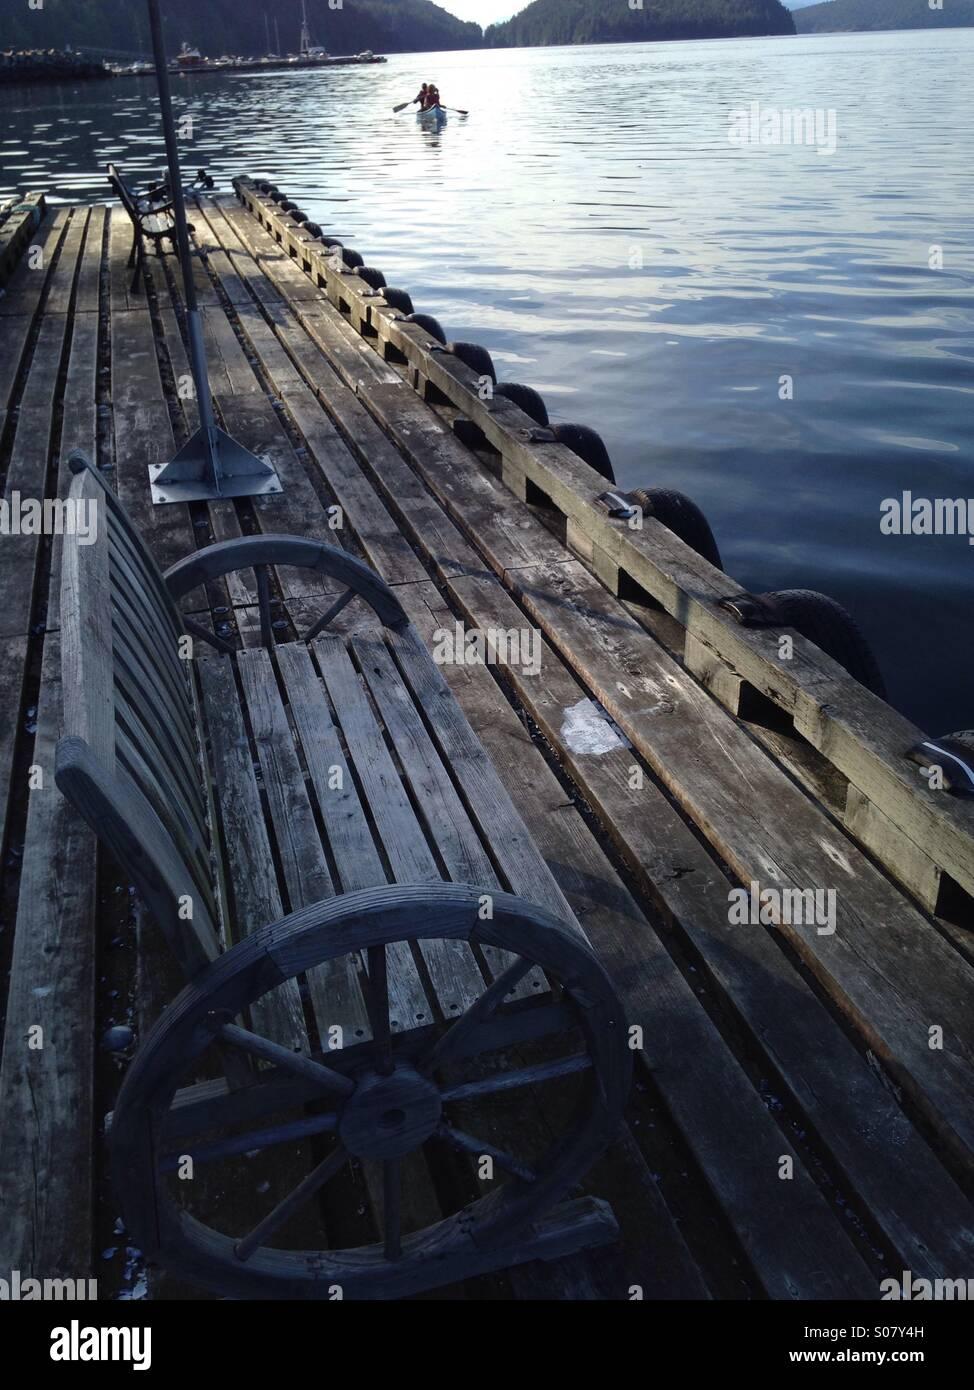 Dock, Desolation Sound, British Columbia, Canada - Stock Image